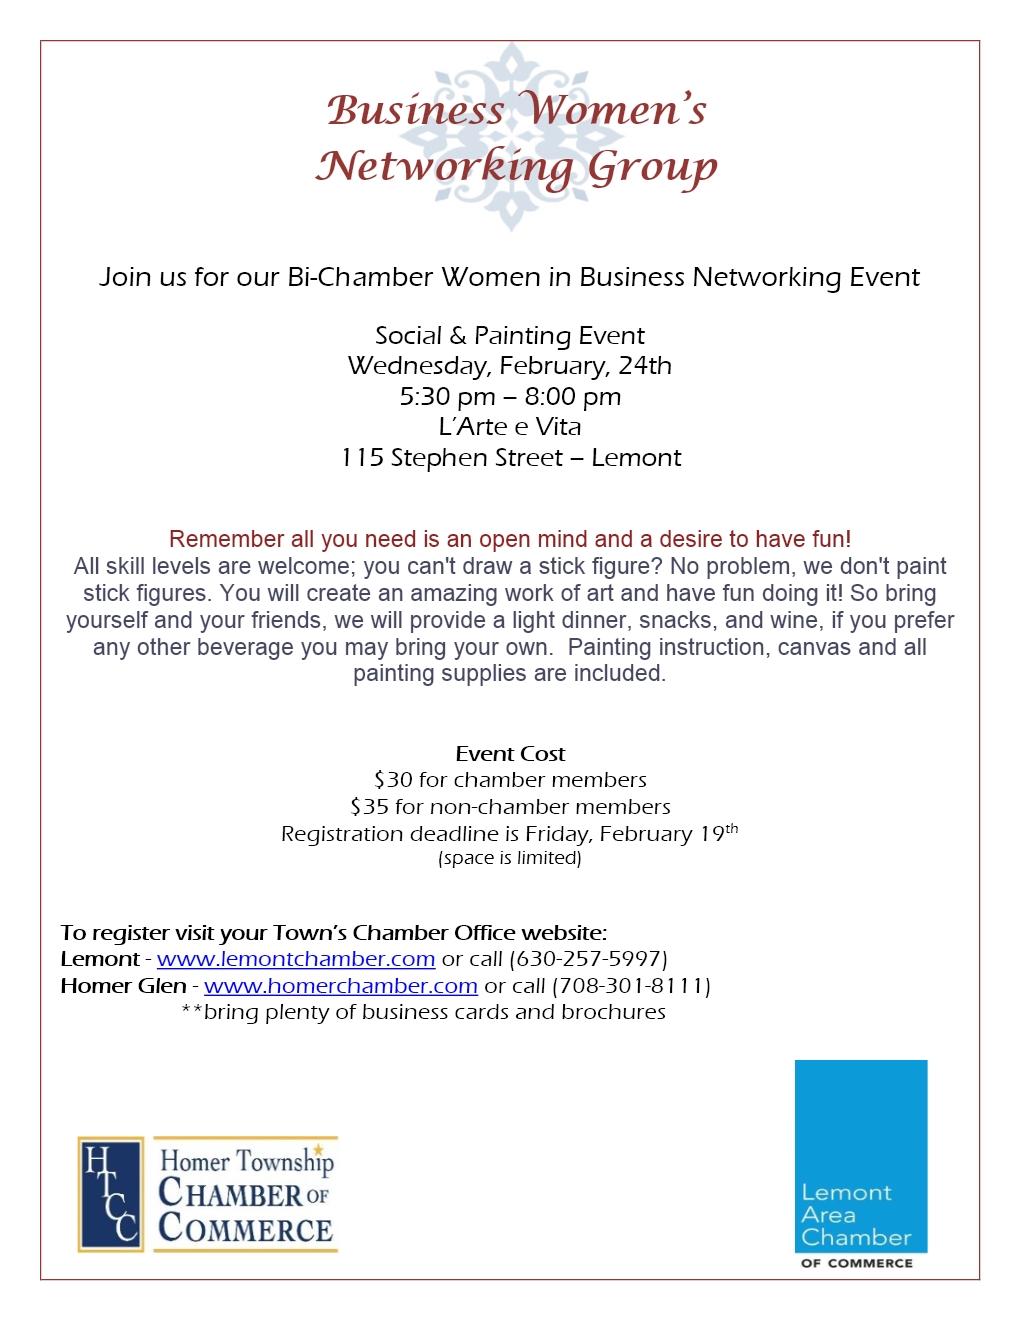 Business_Women_Networking_Group_Flyer_Feb_2016-1(1).jpg